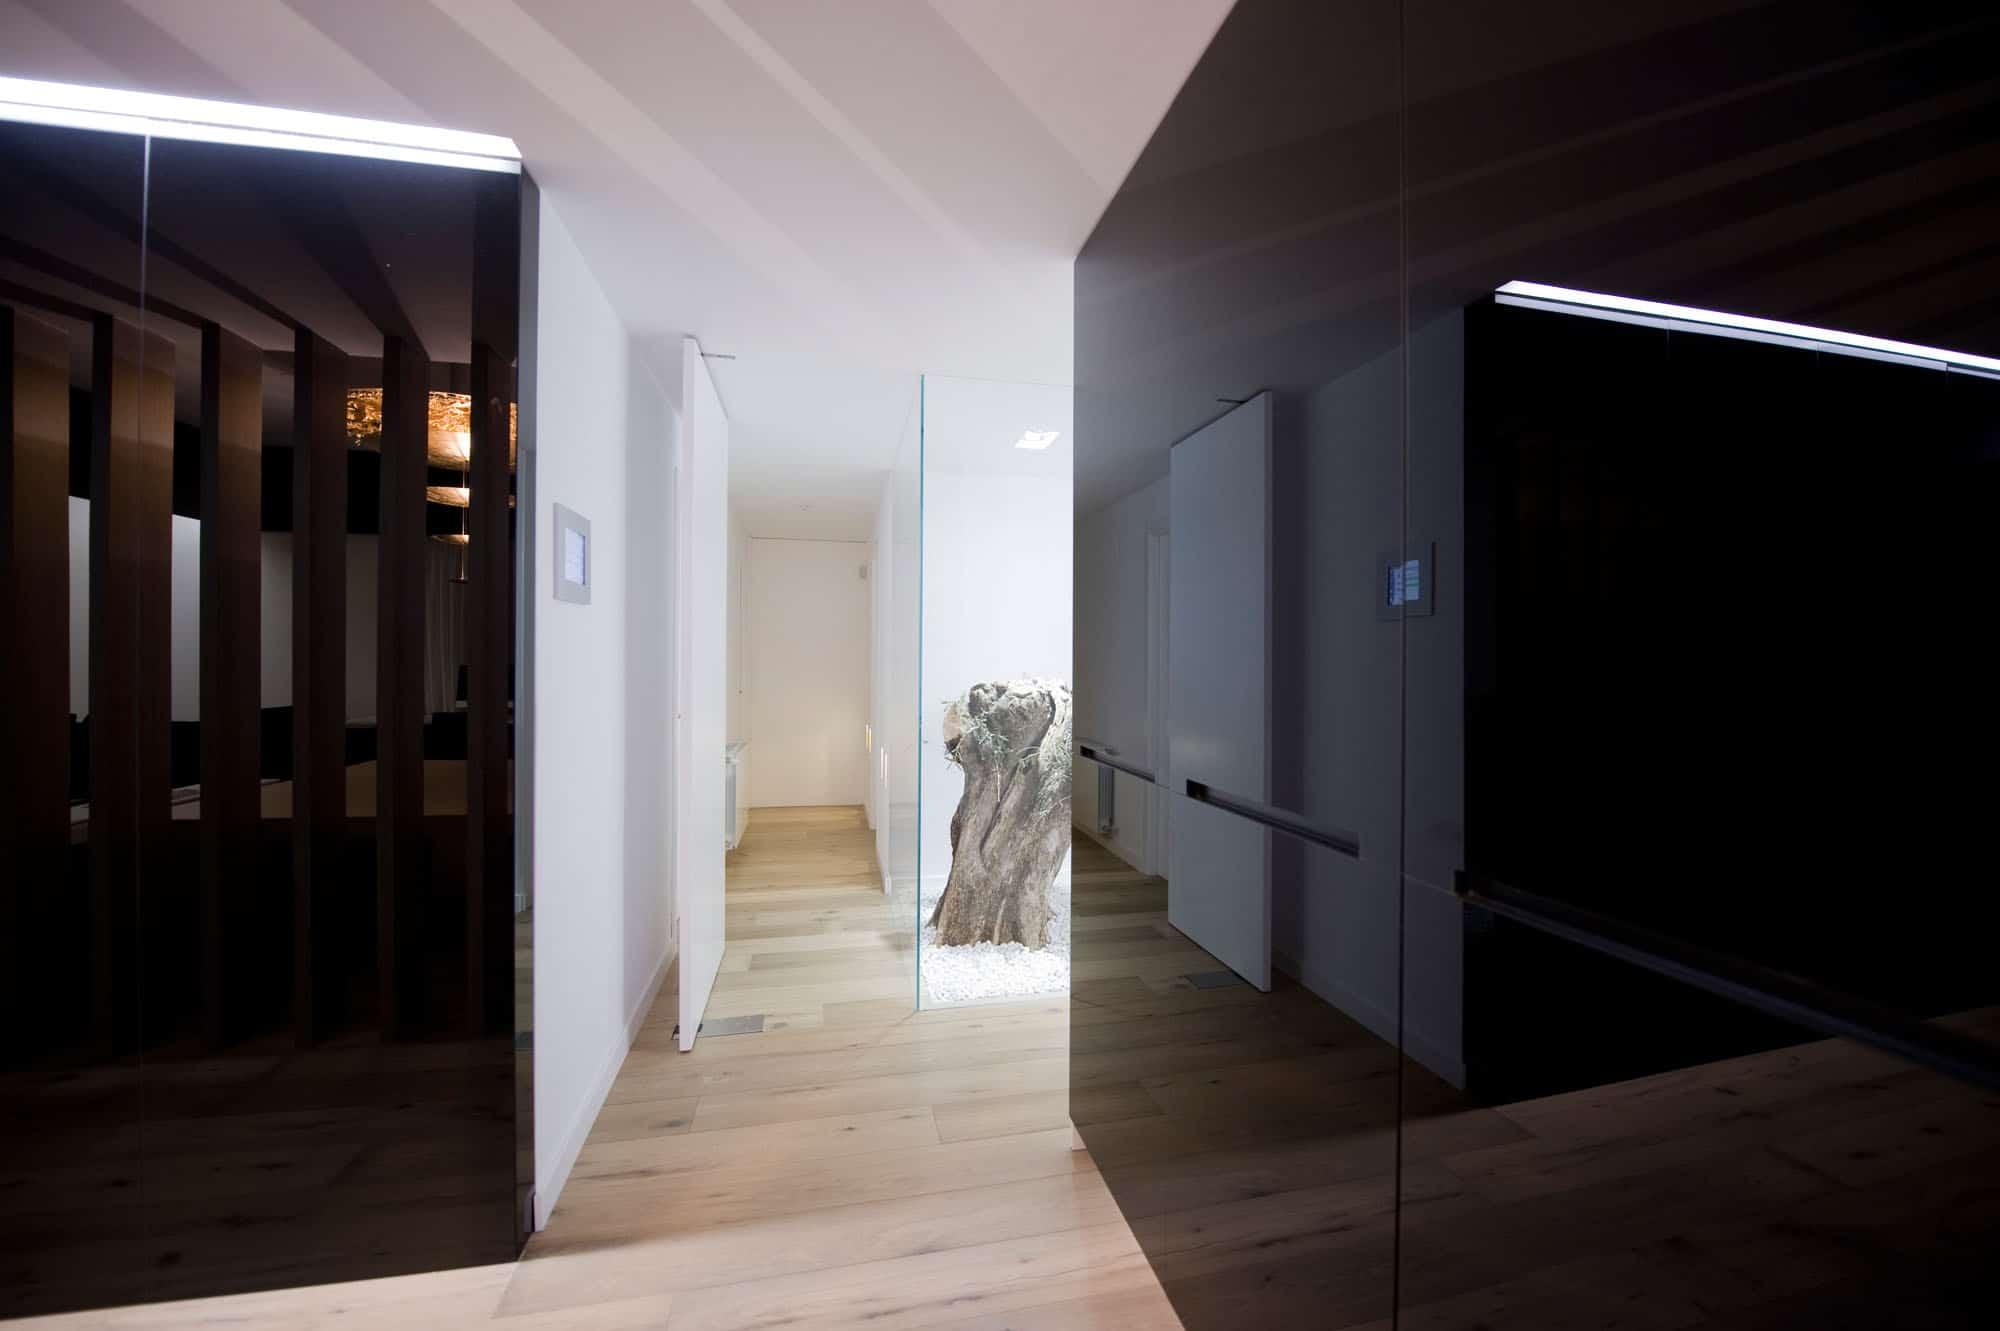 HI-MACS Doble Dueto Apartment by Cuartopensante (1)